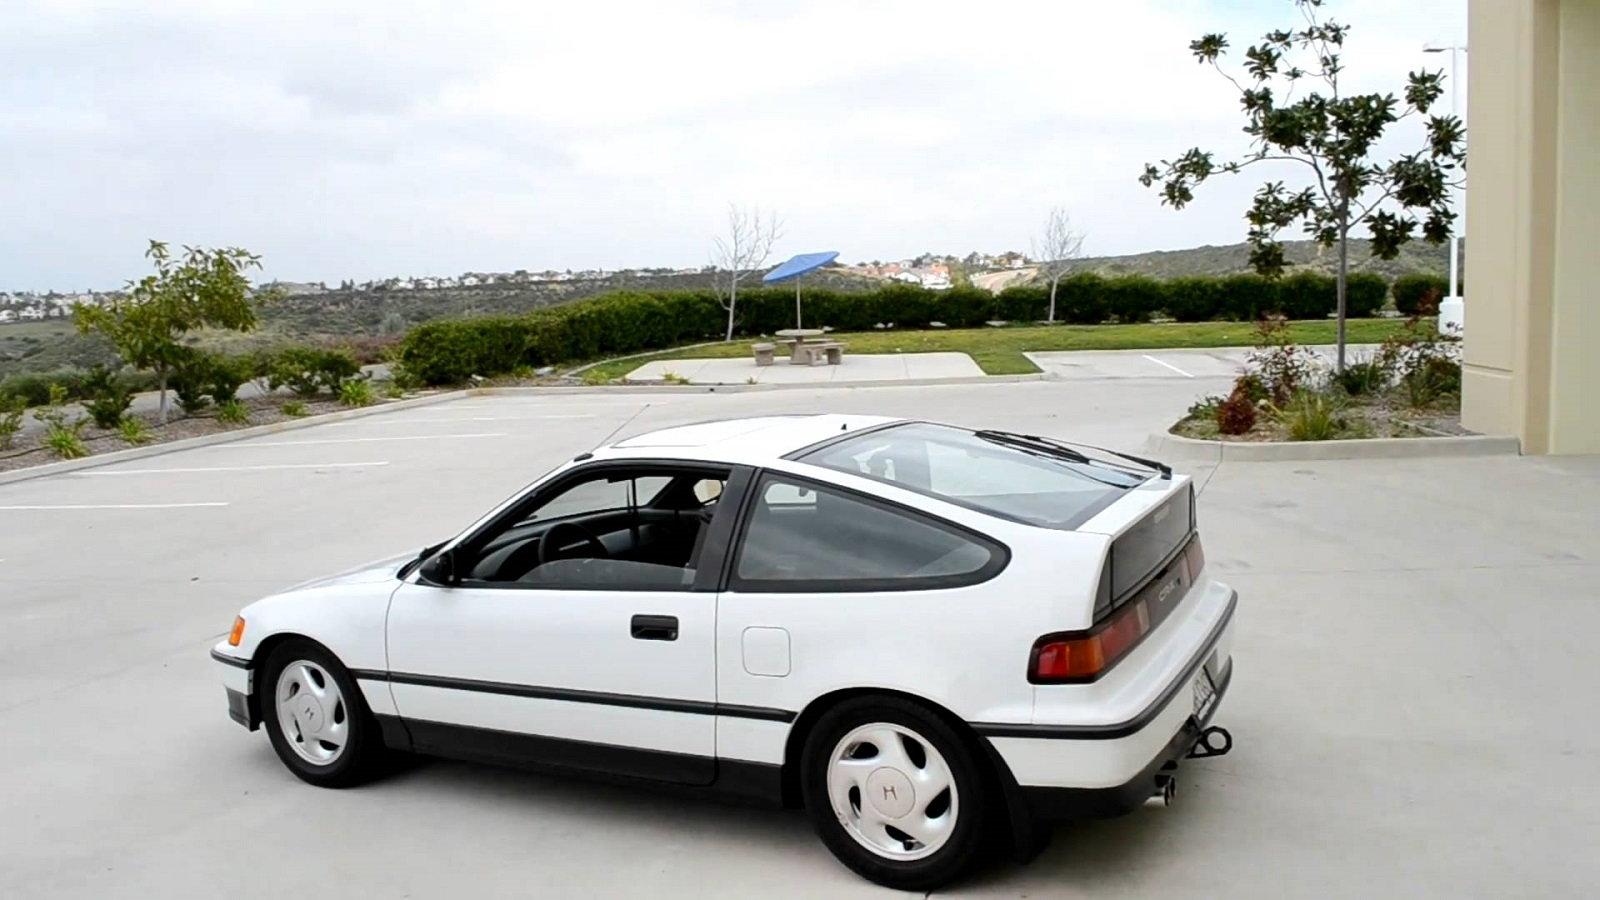 4. Do you like old cars?